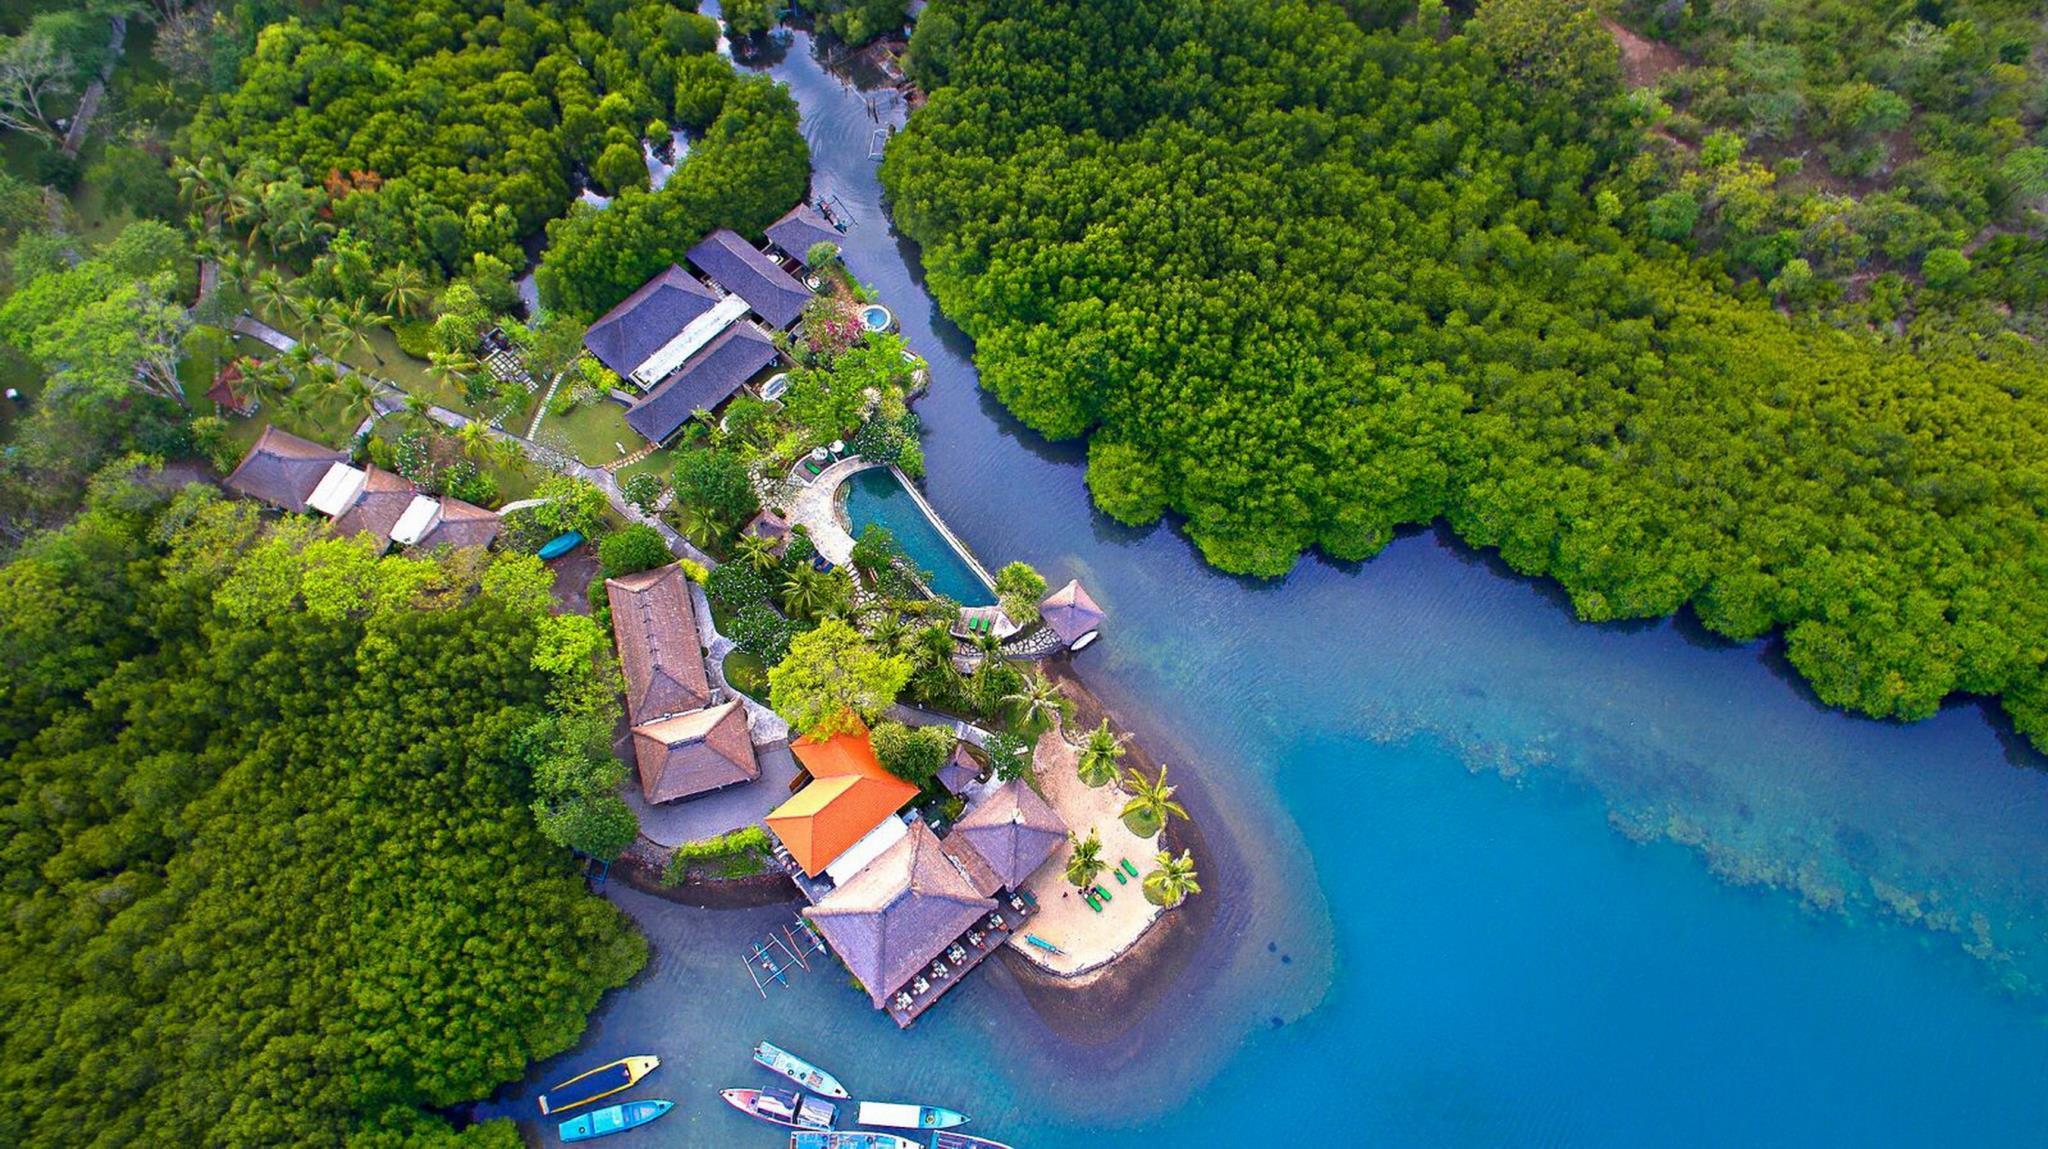 grossiste 02b11 d1061 Mimpi Resort Menjangan - Bali - - Indonesia Hotels - Hotels55